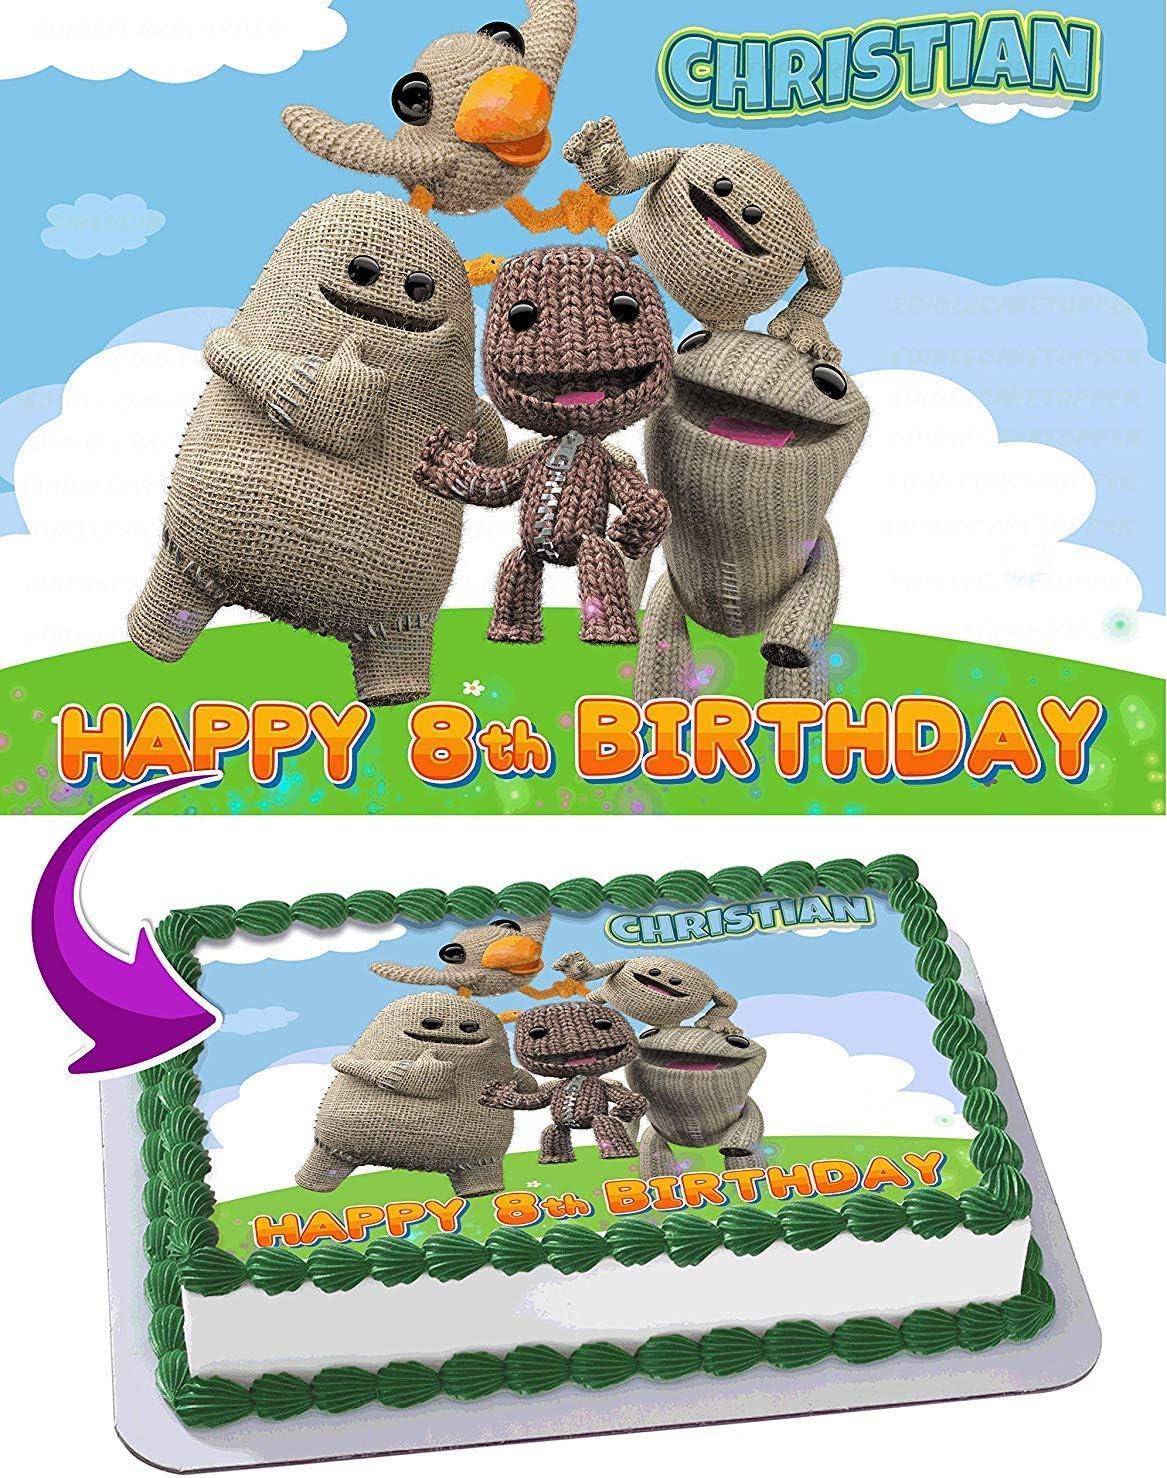 Wondrous Amazon Com Littlebigplanet Edible Cake Image Topper Personalized Birthday Cards Printable Riciscafe Filternl